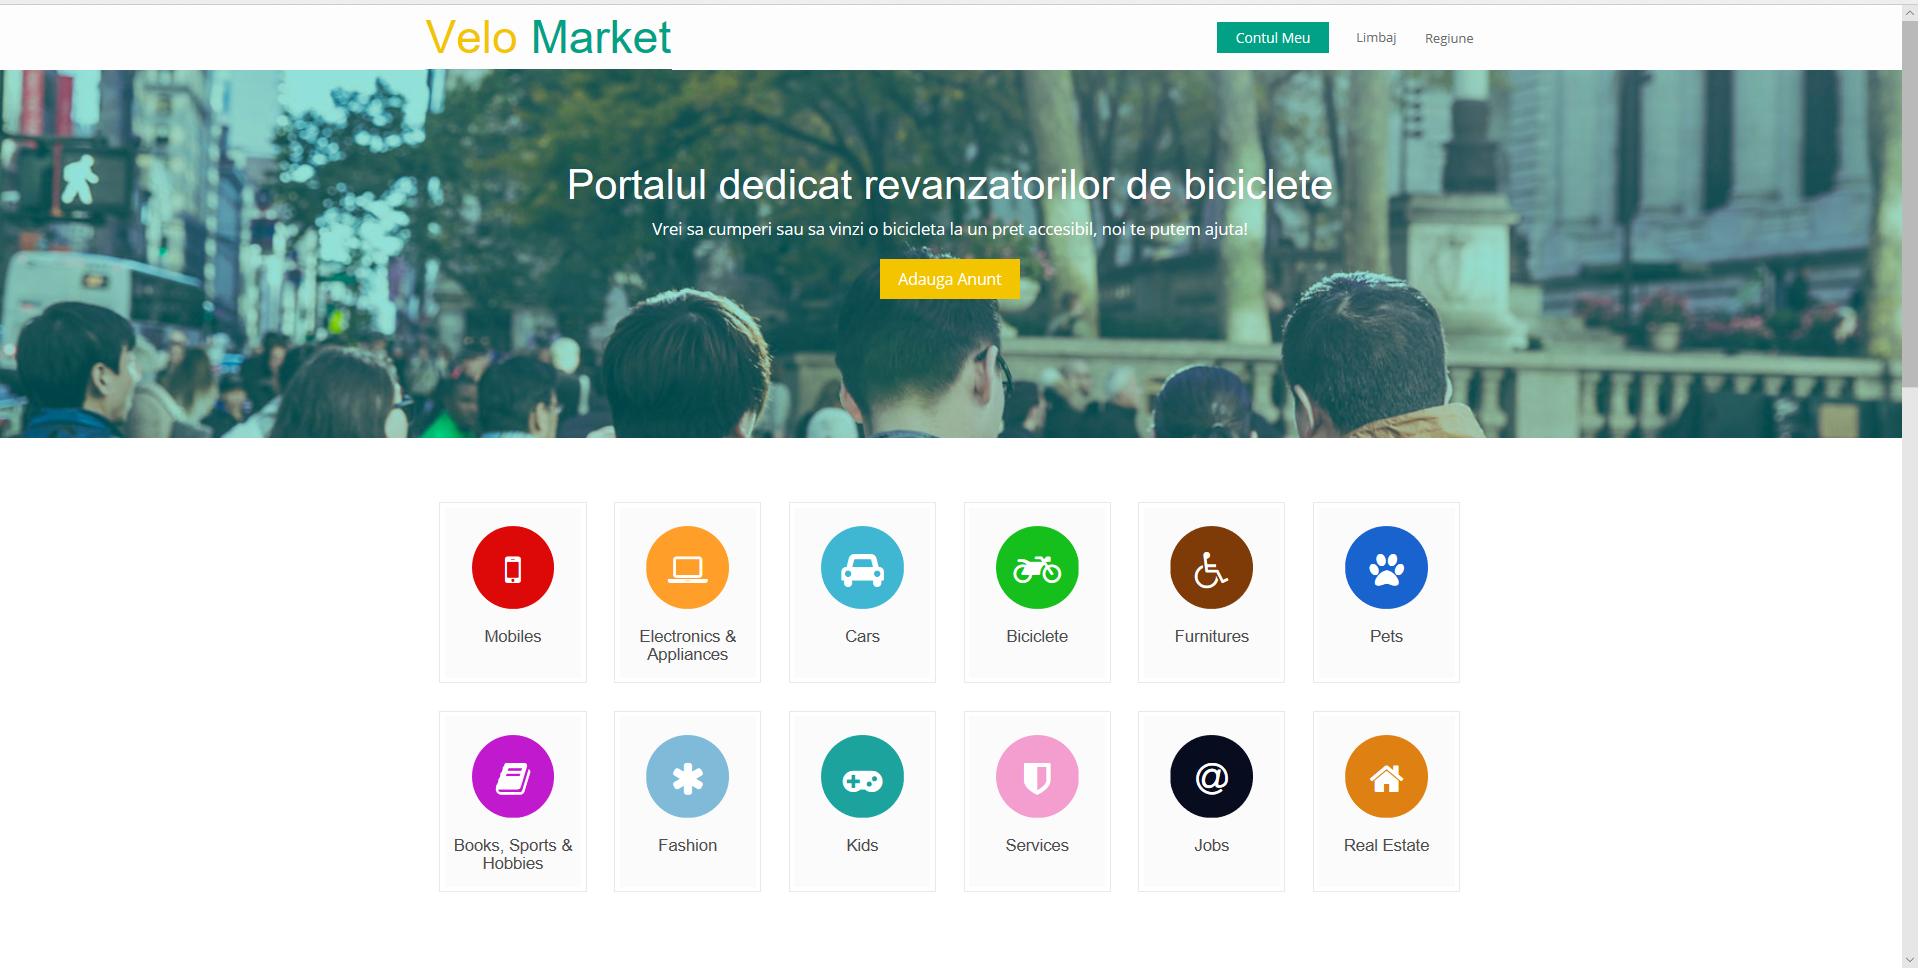 velo market